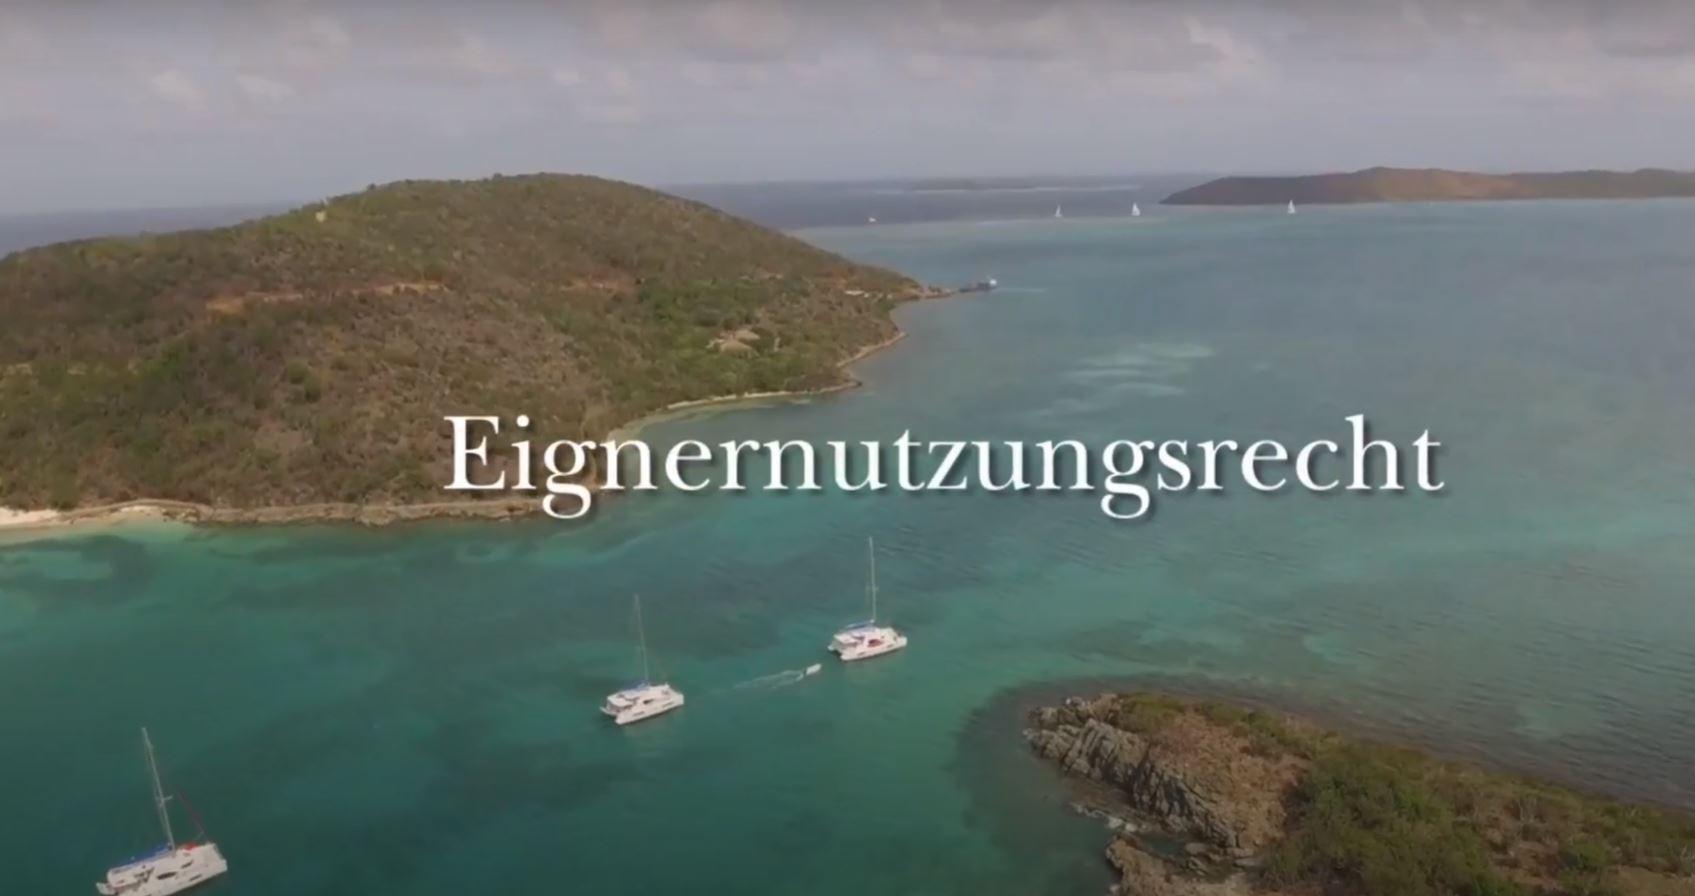 Moorings - Yachteignerprogramm 2017